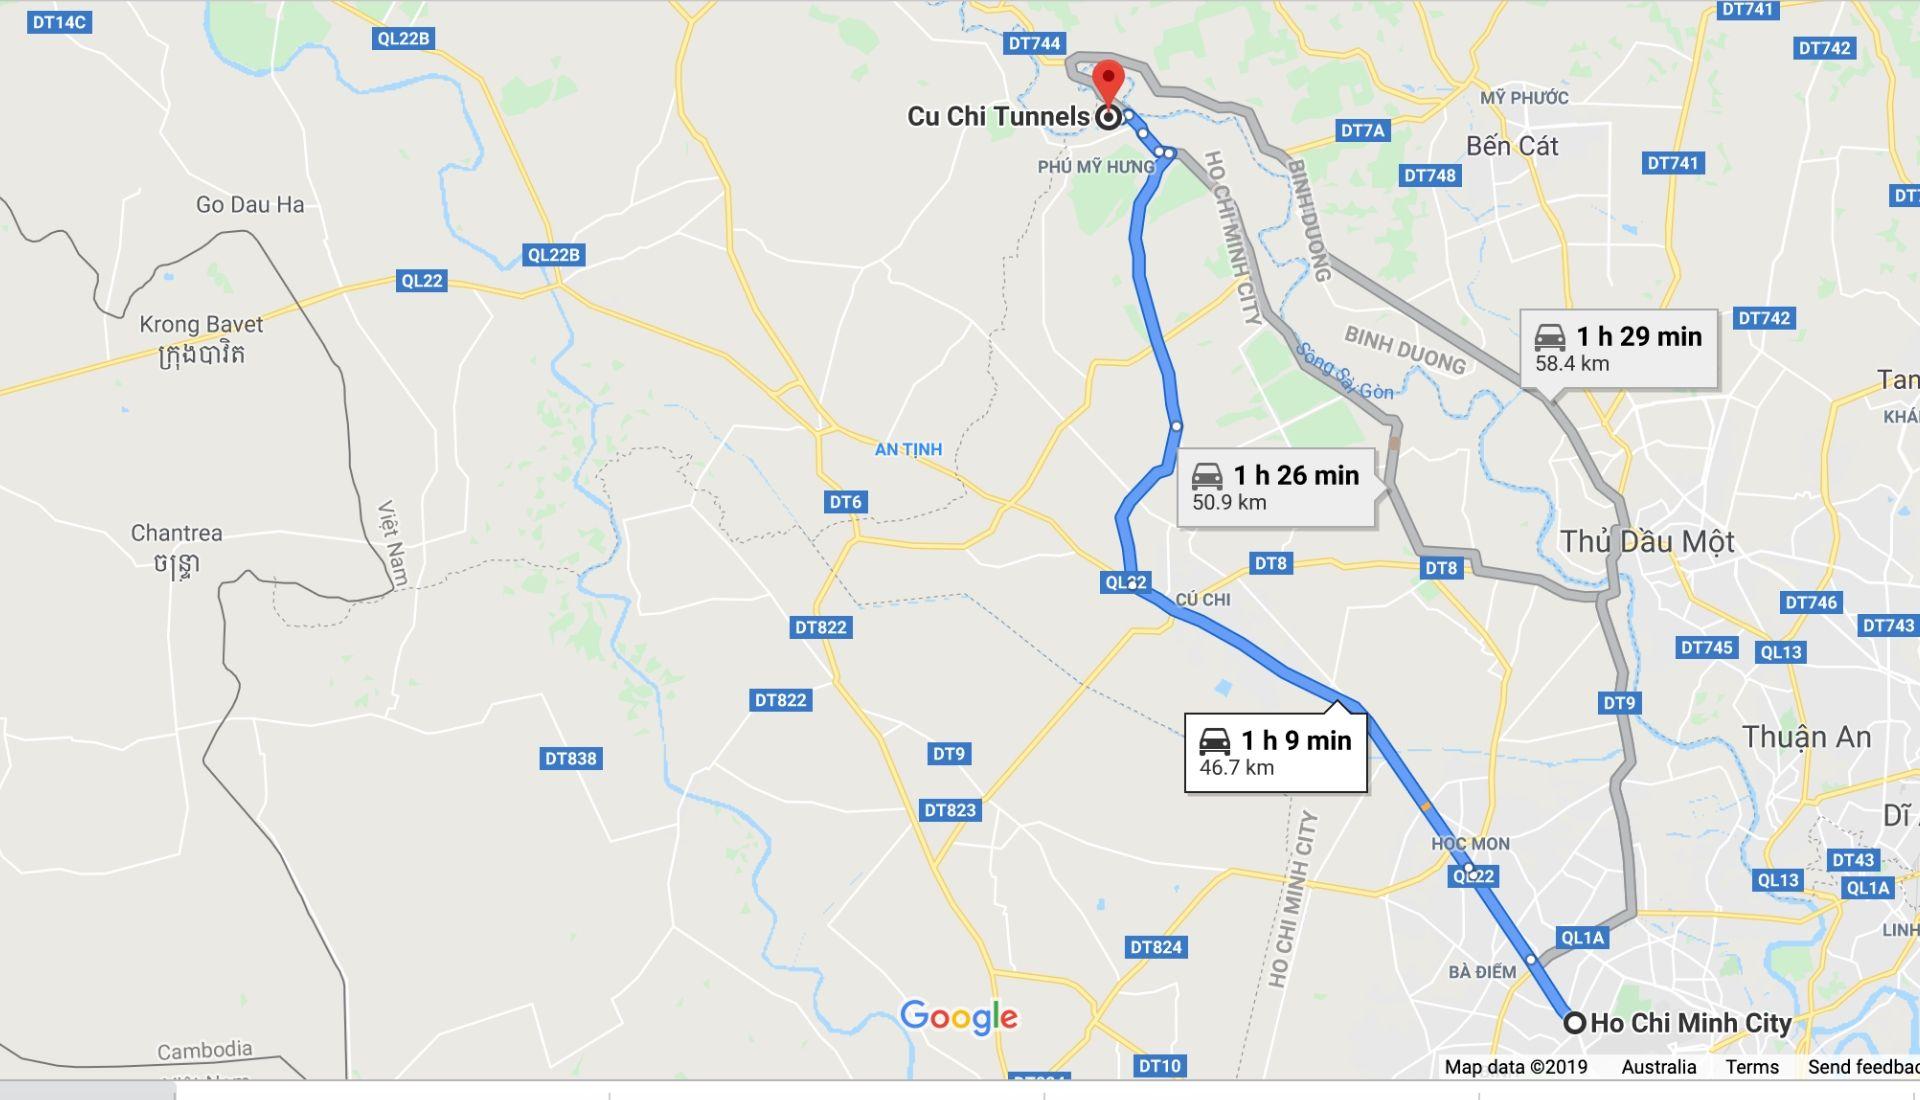 Cu Chi Tunnels Location Map